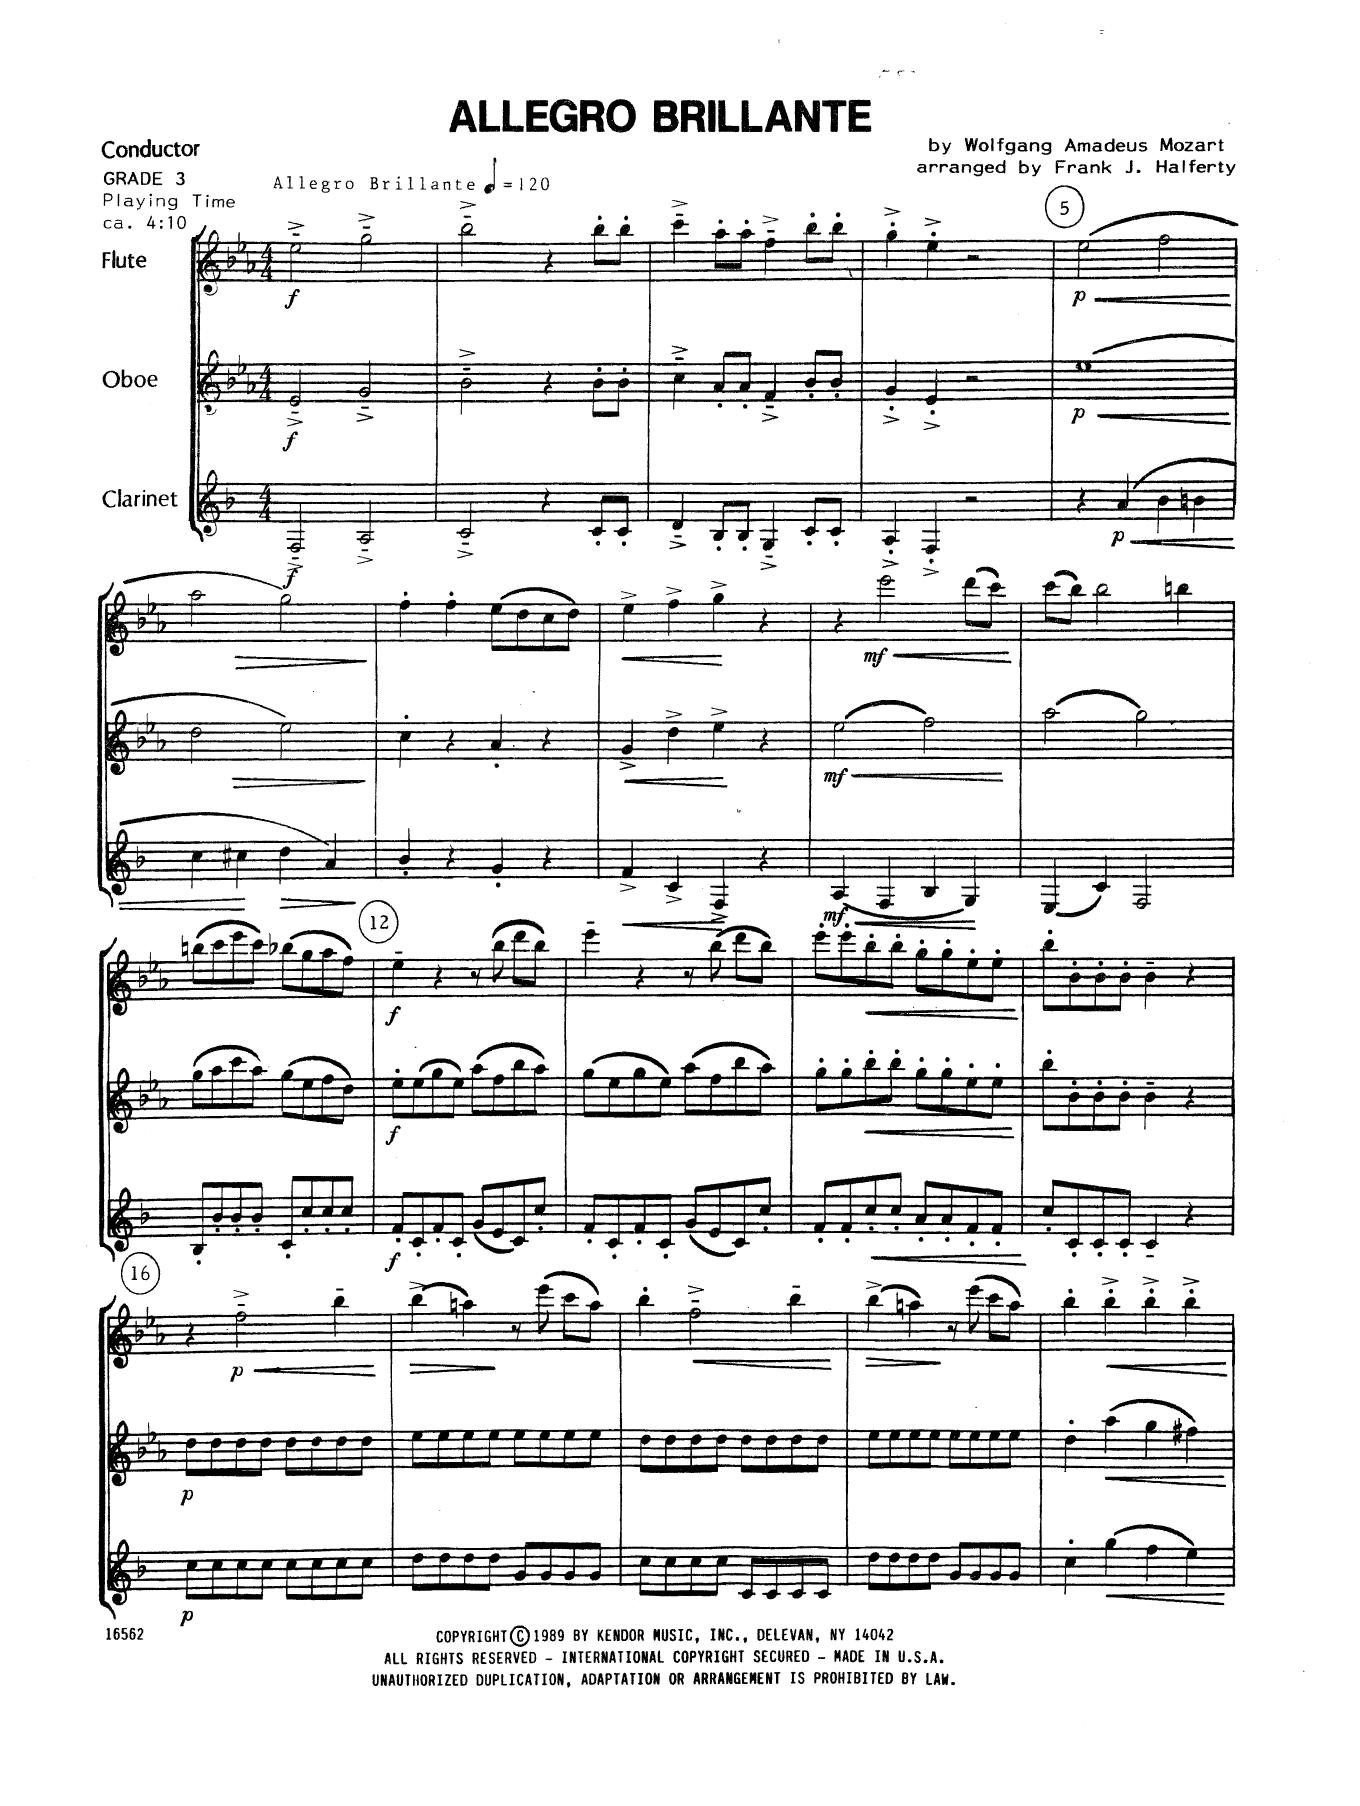 Allegro Brillante - Full Score Sheet Music